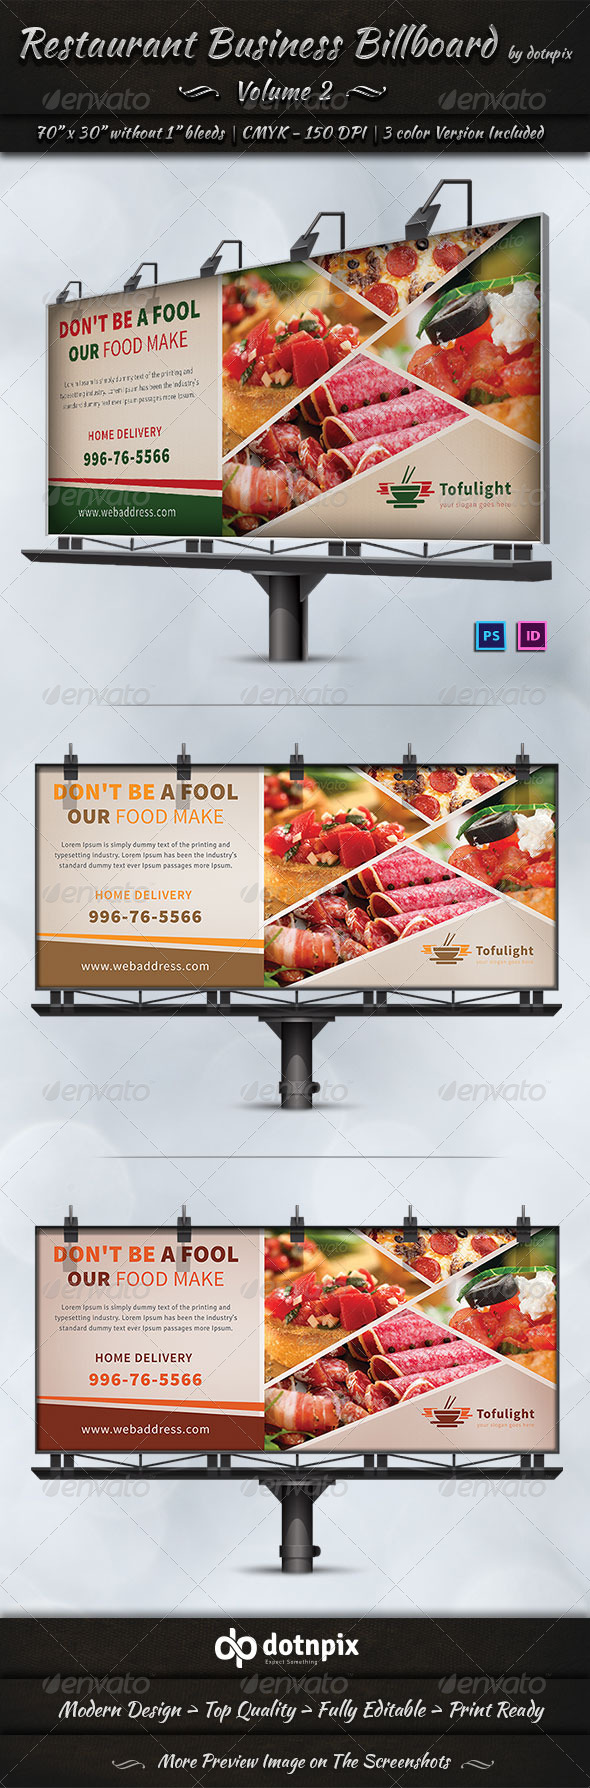 Restaurant Business Billboard | Volume 2 - Signage Print Templates